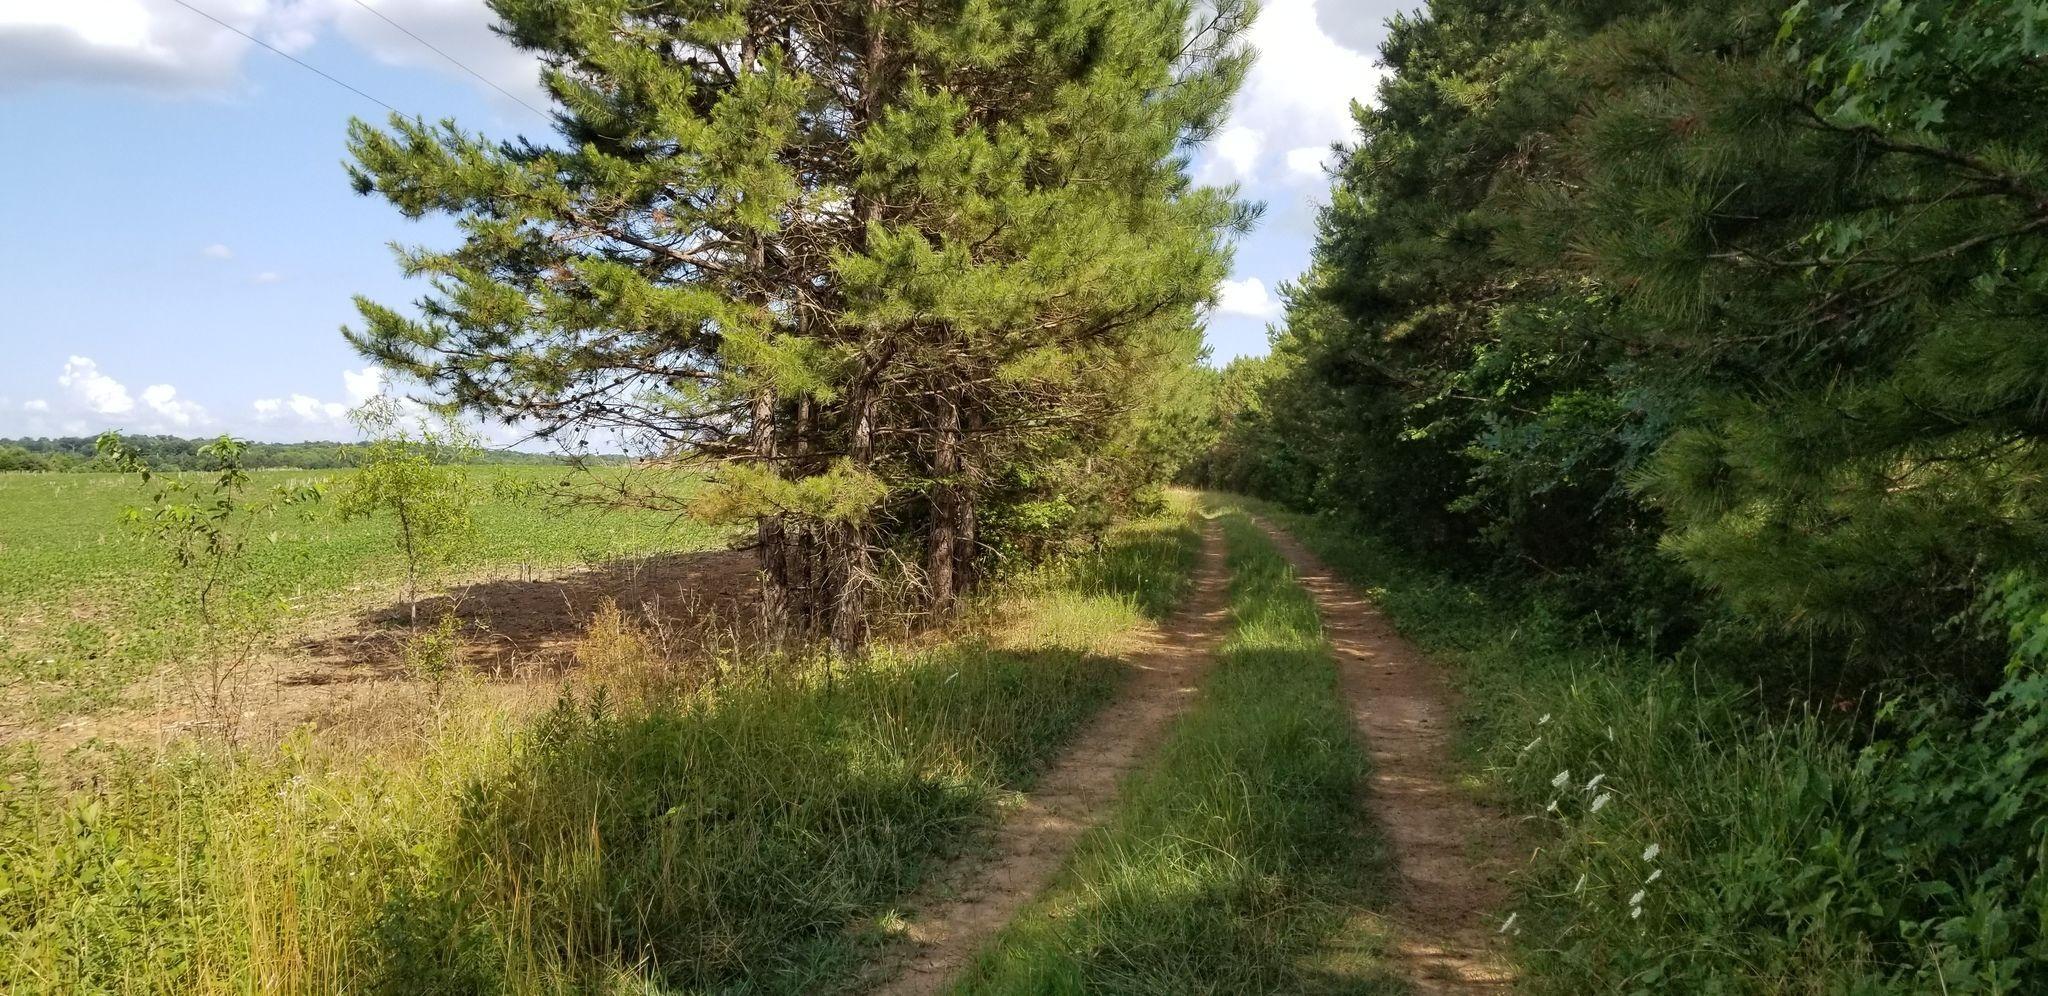 Take A Suspension Bridge Hike Through Buffalo Creek A 393 Acre Preserve In North Carolina In 2020 Experience Nature Buffalo Creek North Carolina